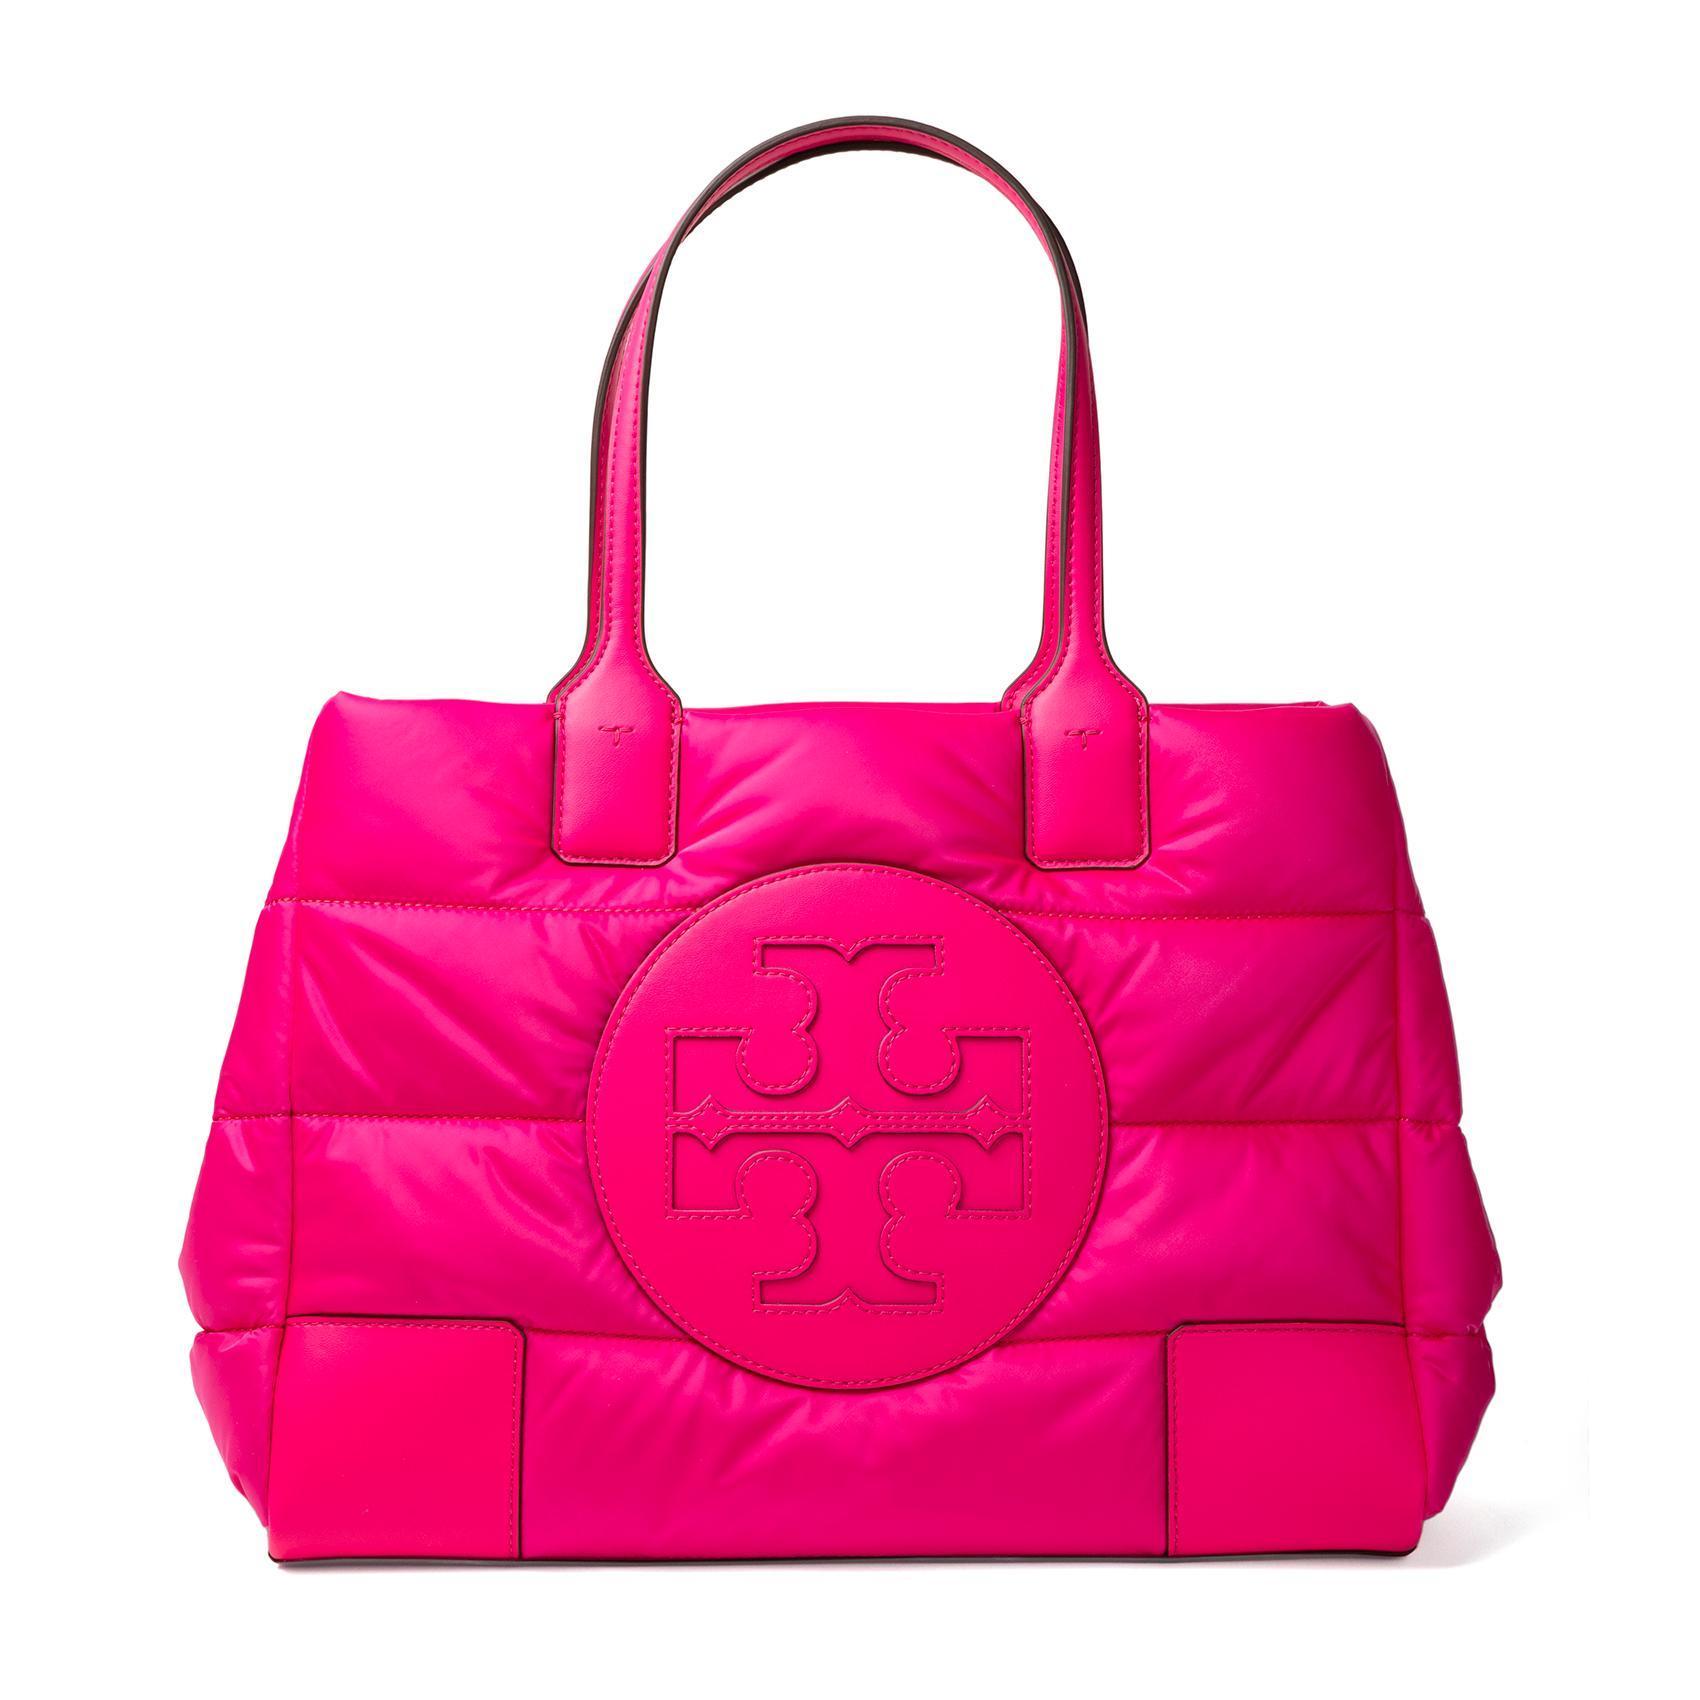 Tory Burch Pink Husky Ella Tote